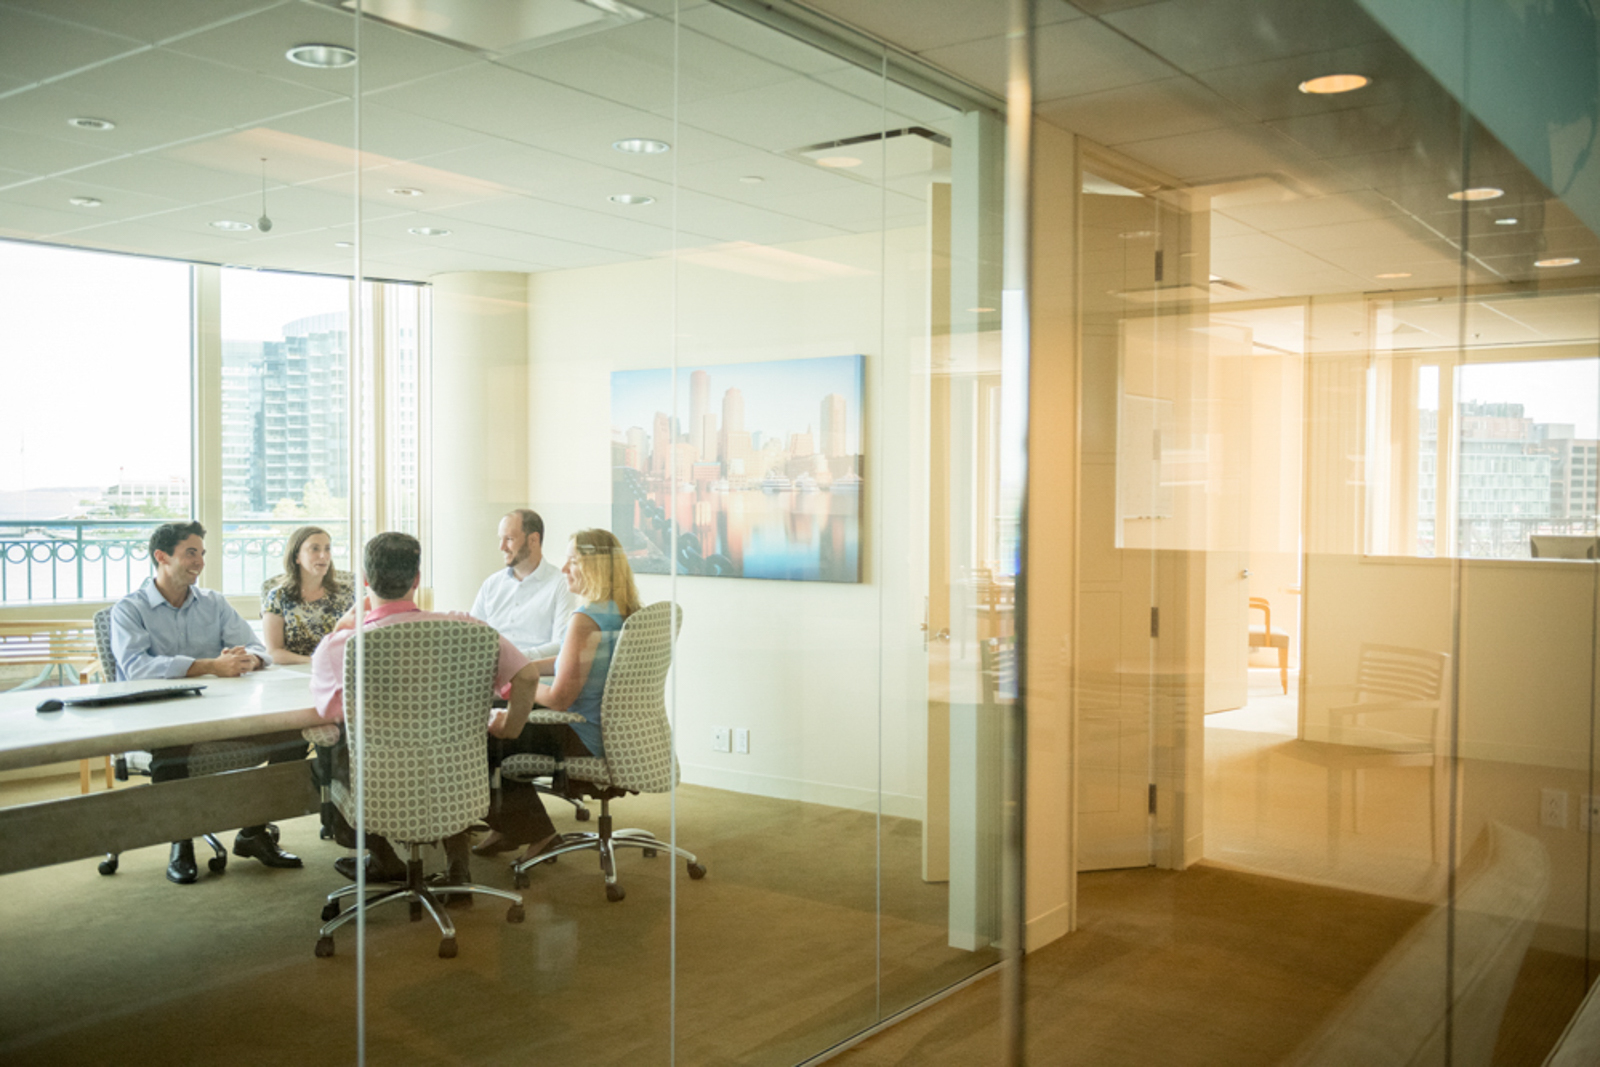 Image of an office meeting seen through a window